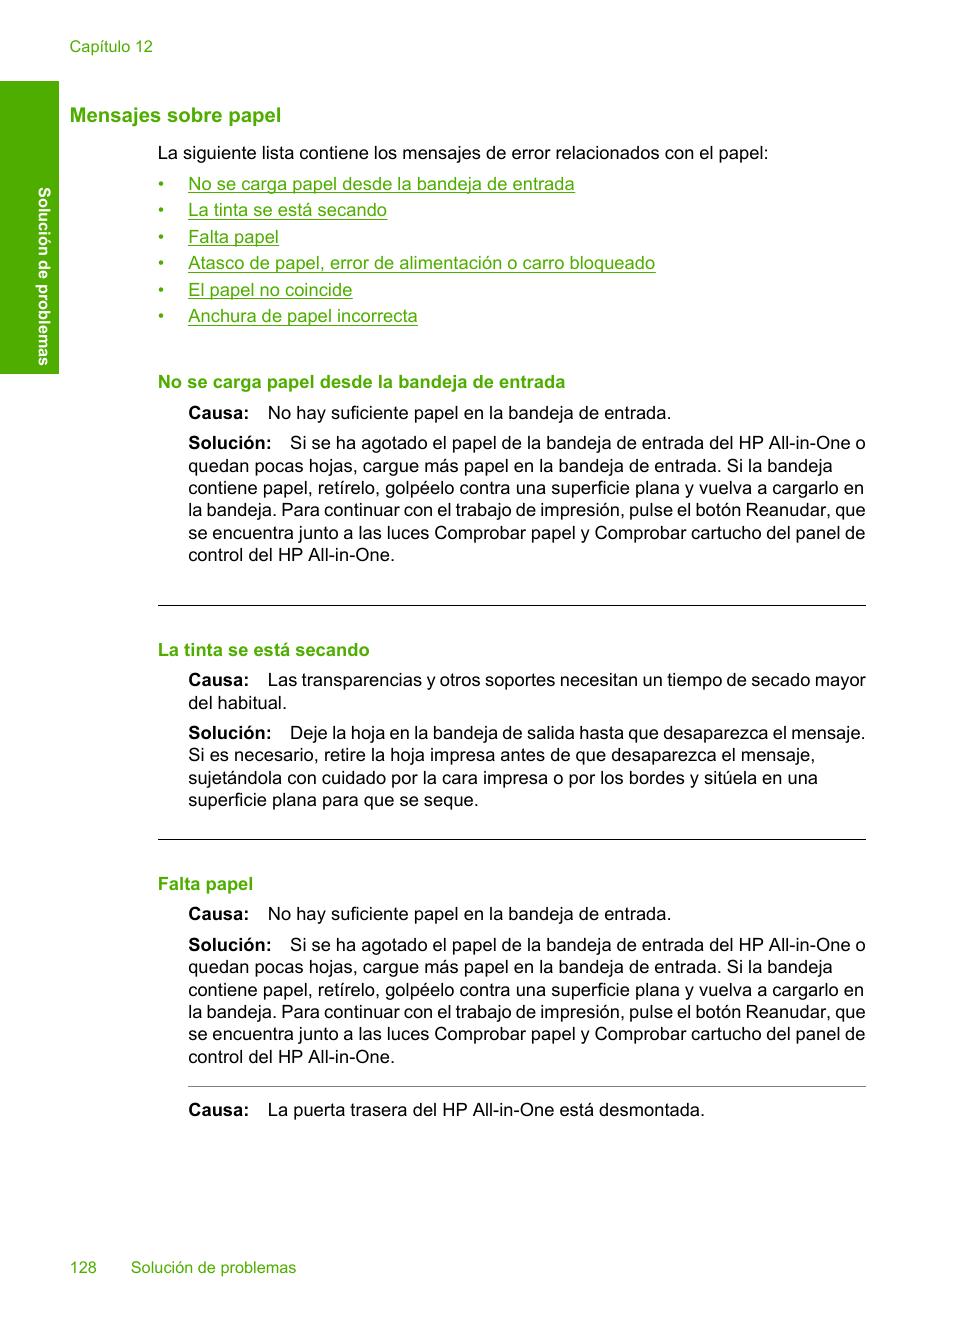 Mensajes sobre papel | HP Impresora Todo-en-Uno HP Deskjet F2180 Manual del